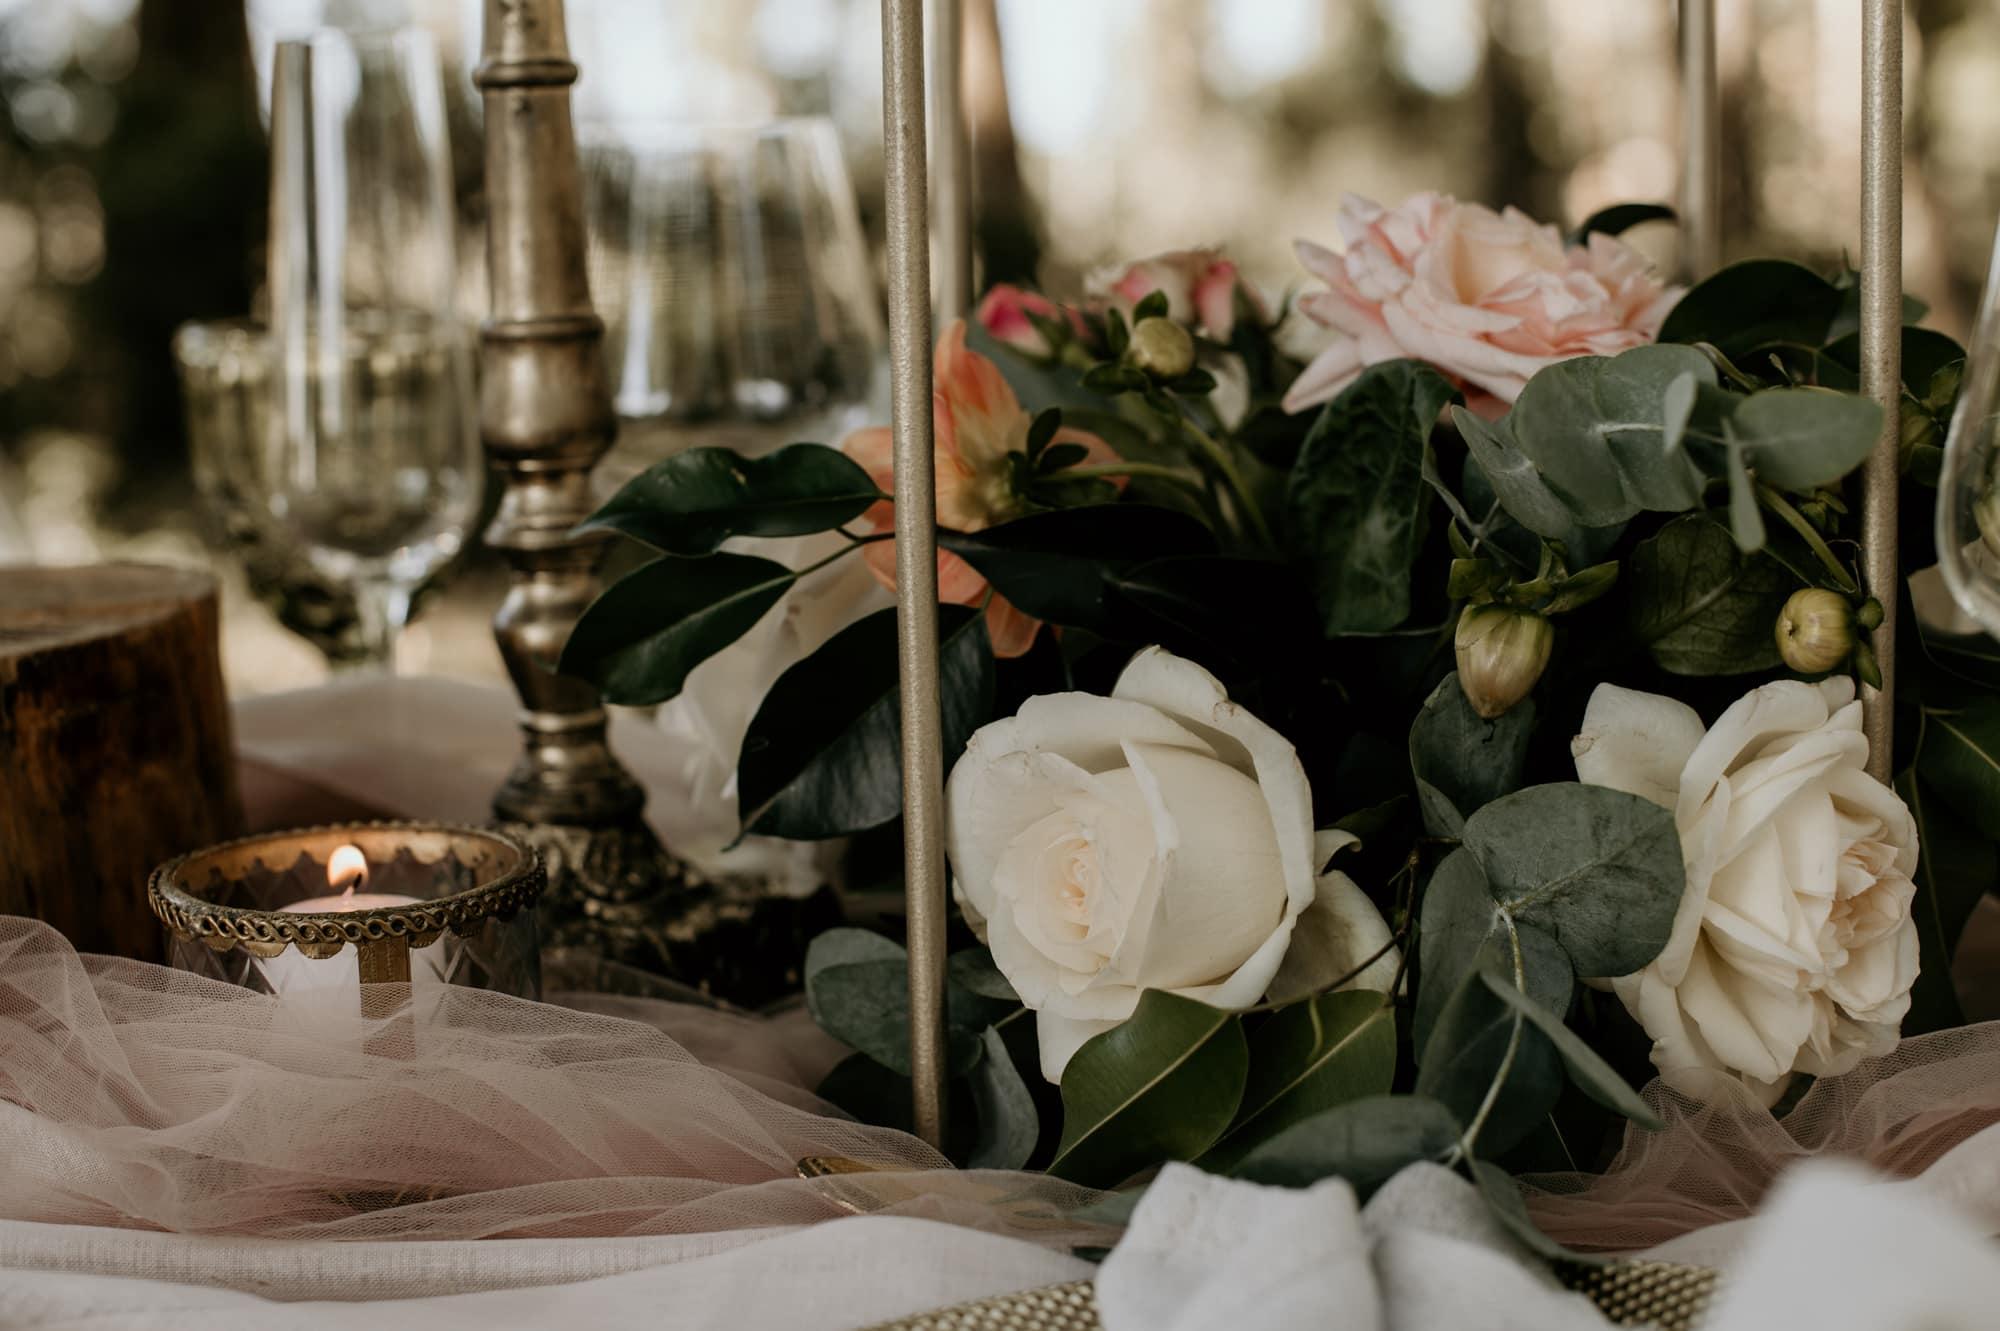 karien-daniel-oakhurst-wedding-June-Richards-Photography-Destination-Weddings-Elopements-Garden-Route-46_1